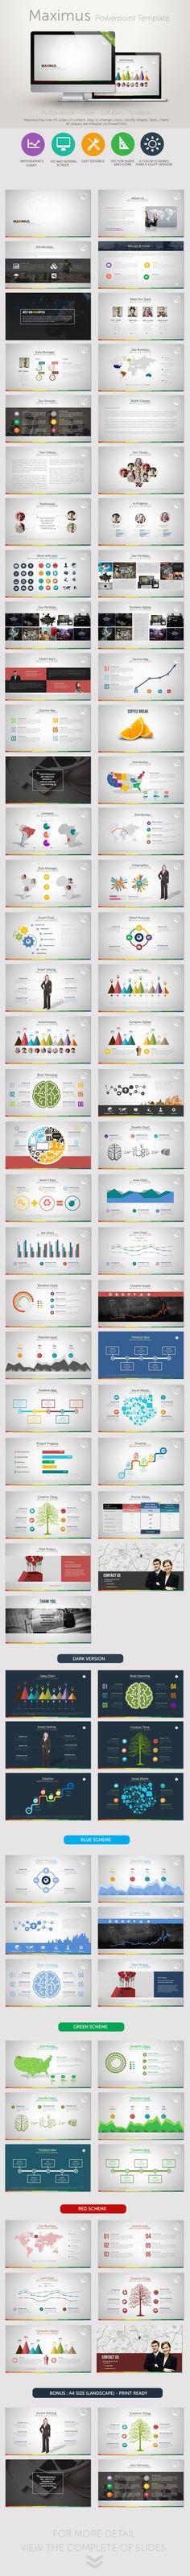 3 in 1 Bundle PowerPoint Template